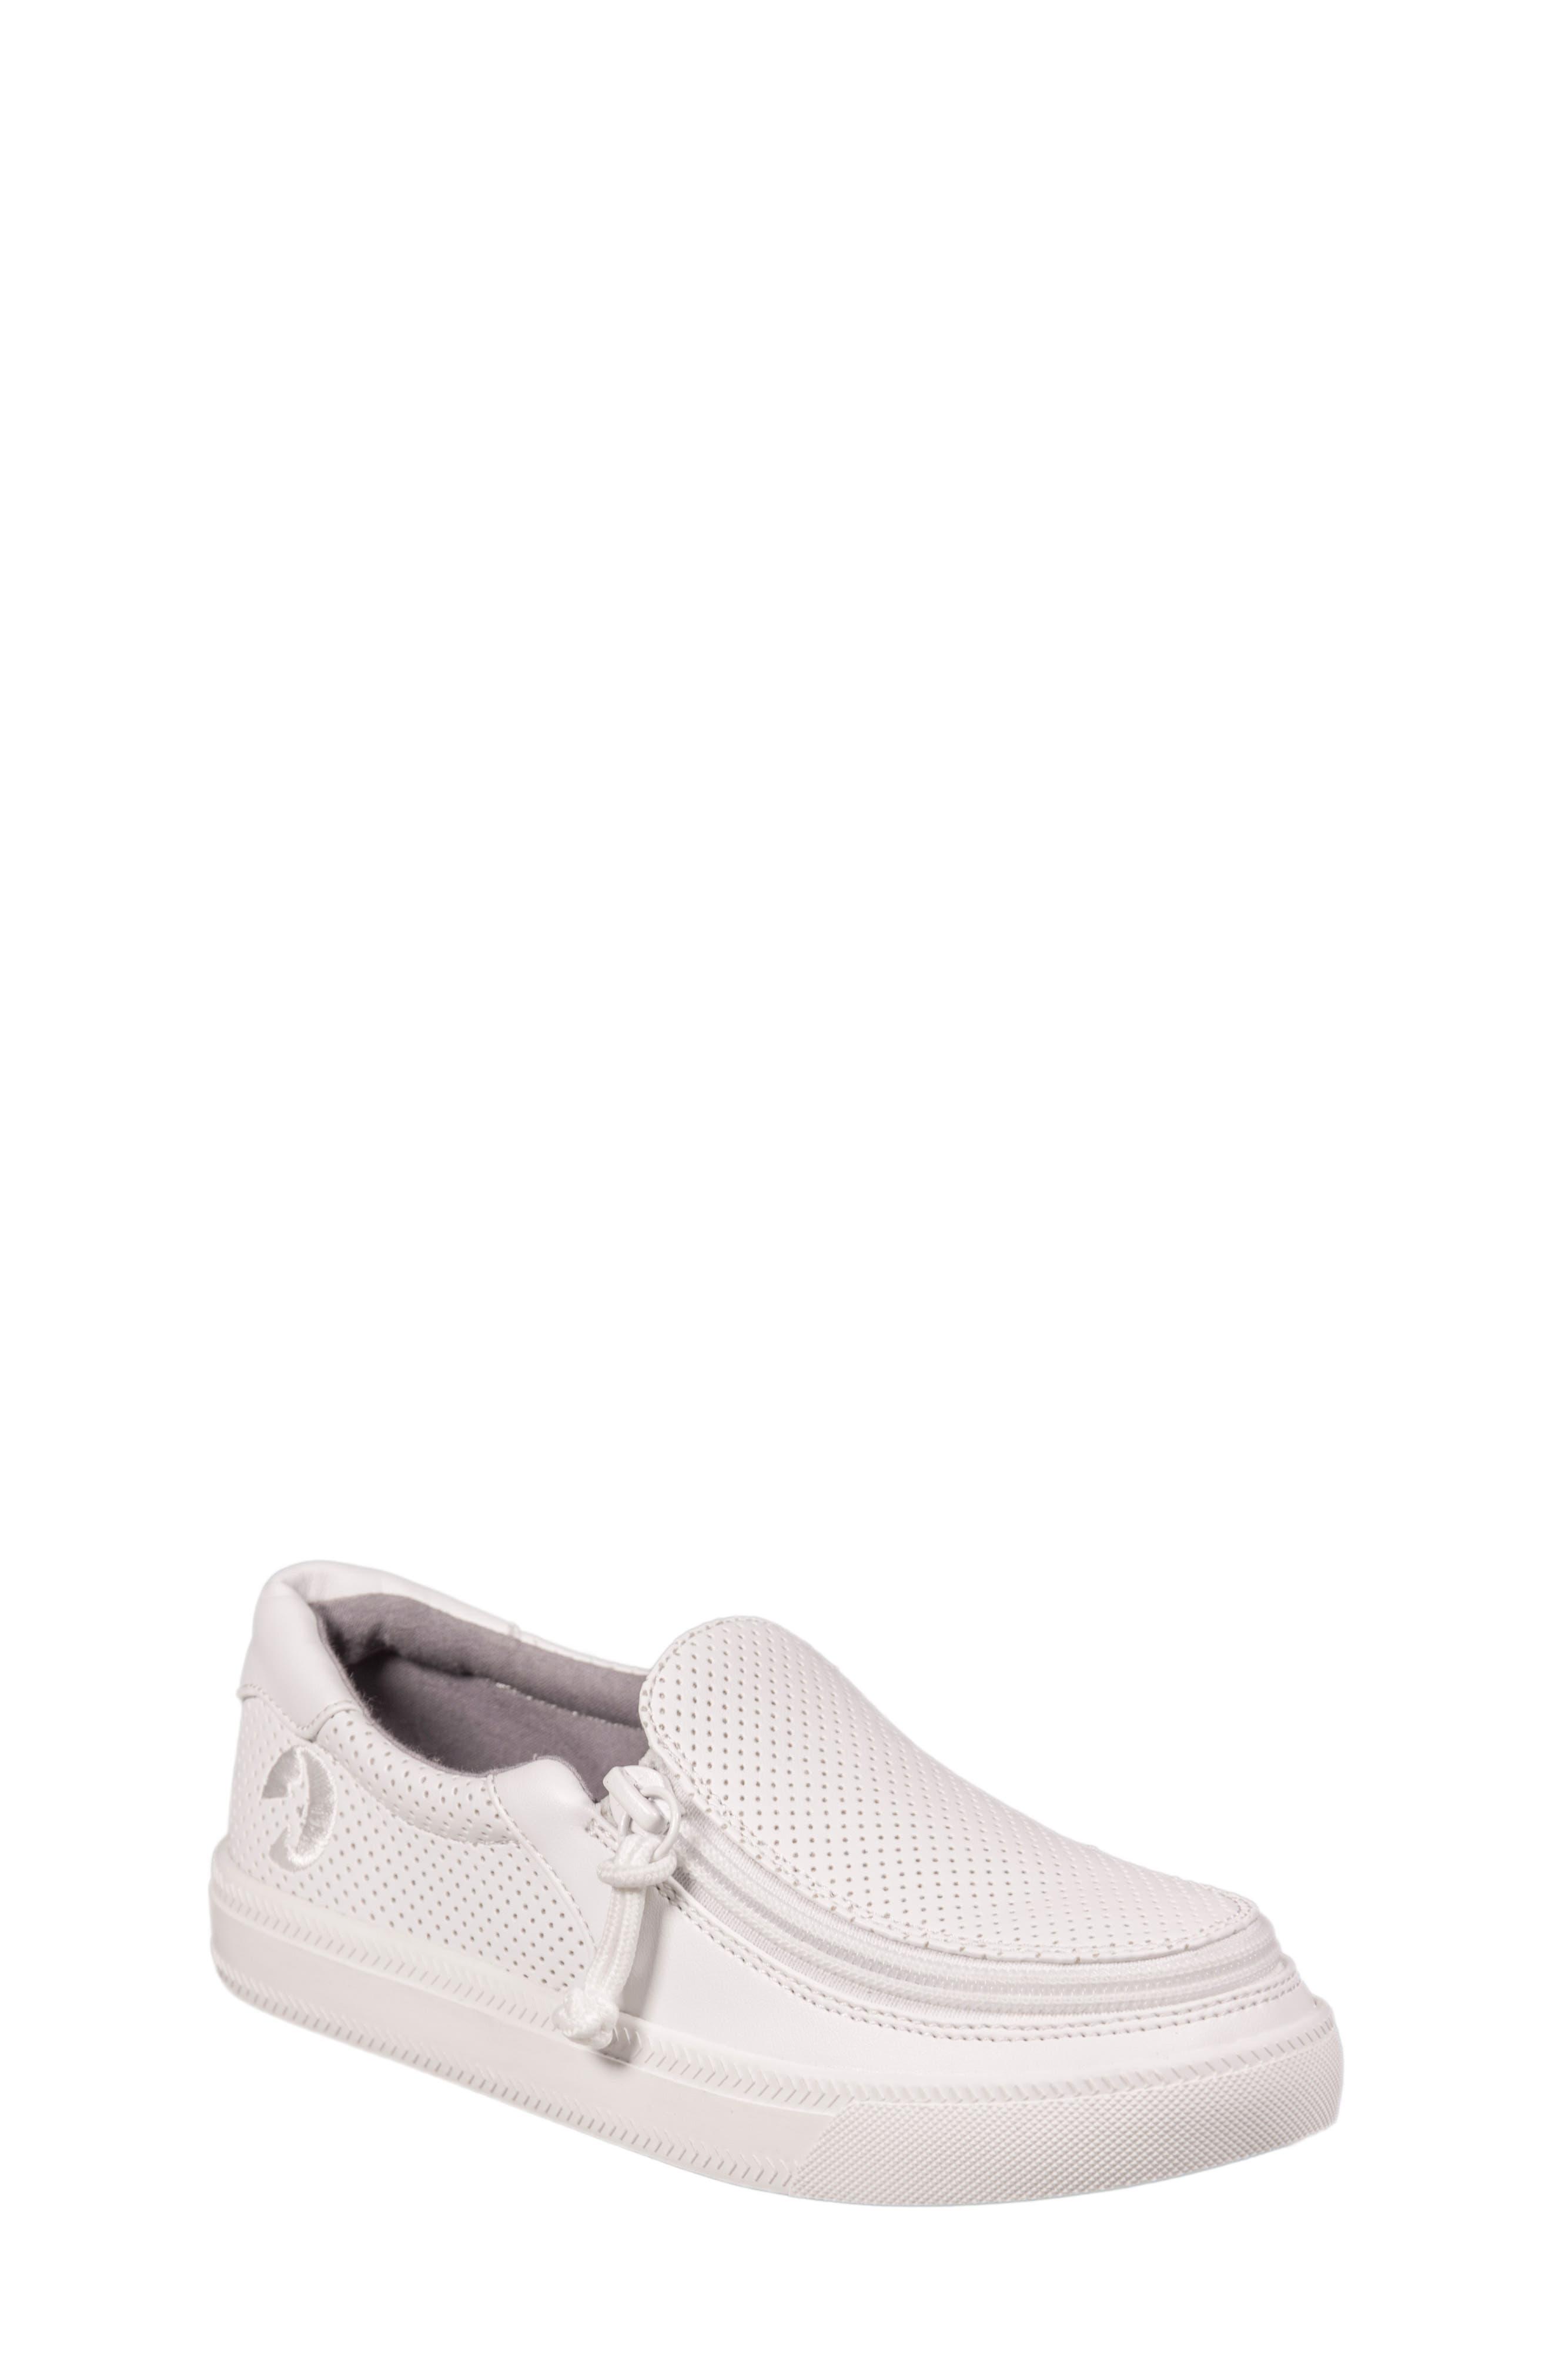 Zip Around Perforated Low Top Sneaker,                             Main thumbnail 2, color,